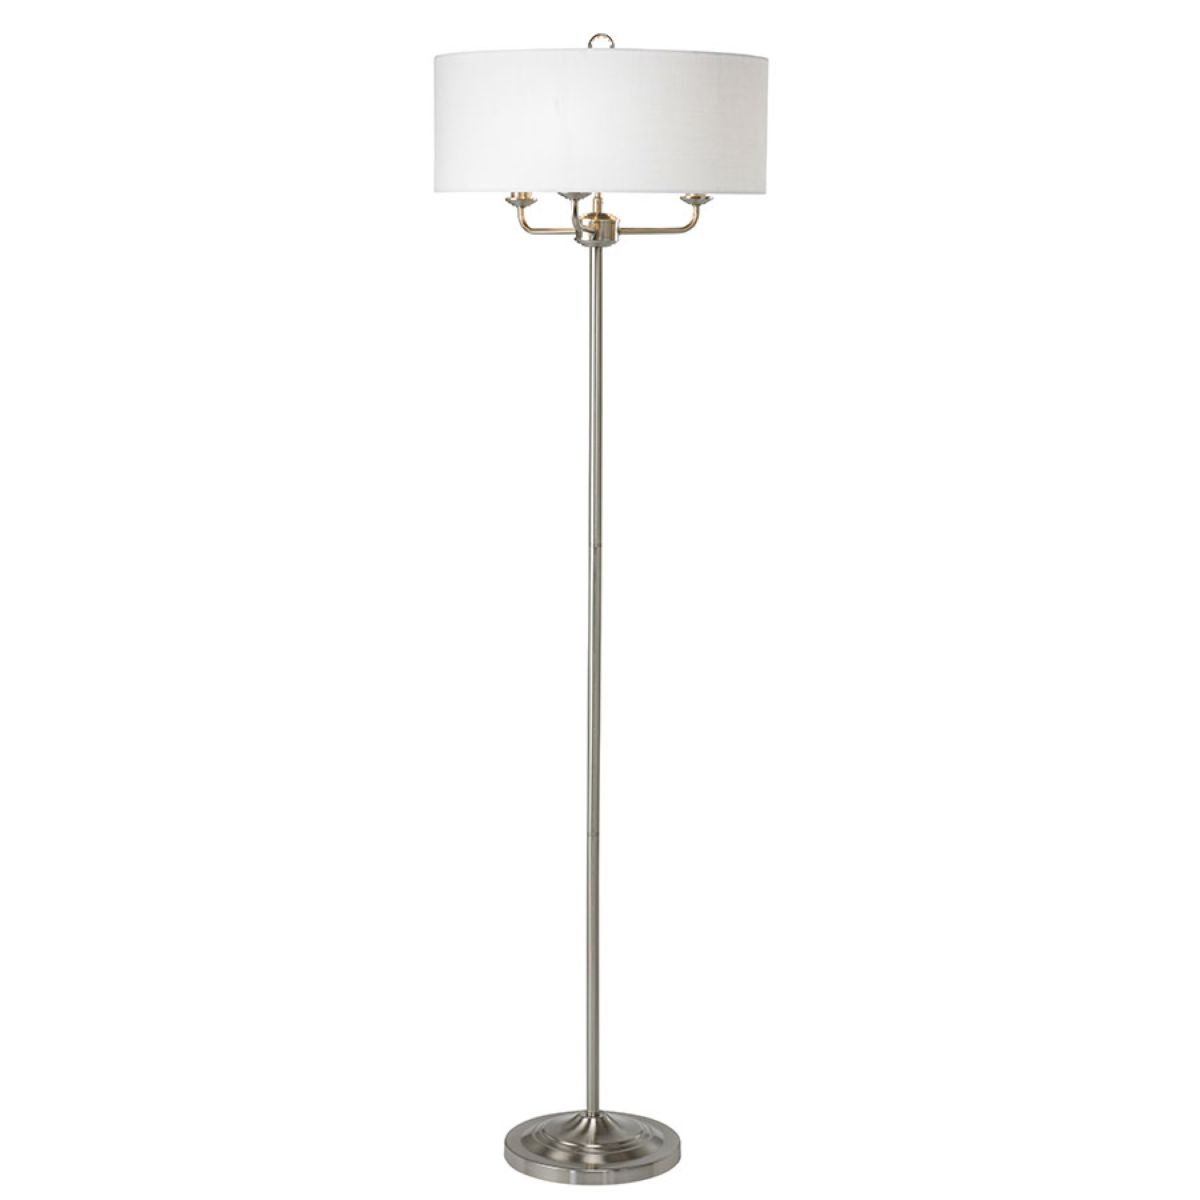 Village At Home Grantham Floor Lamp - Nickel